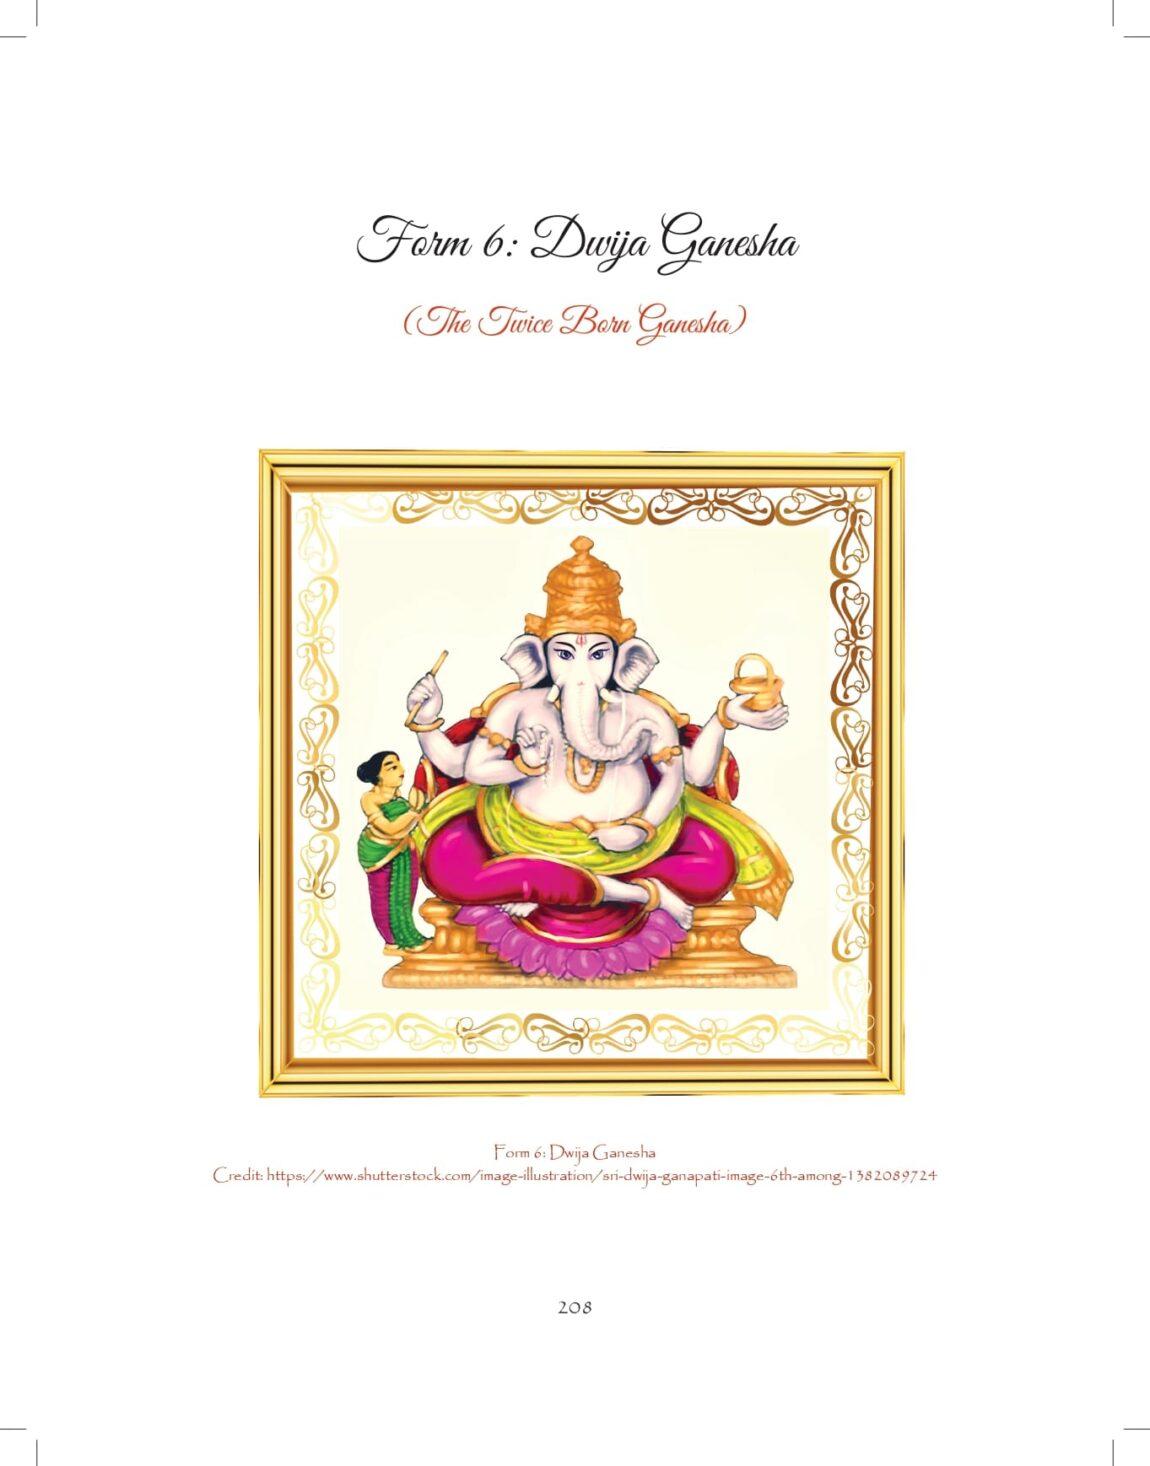 Ganesh-print_pages-to-jpg-0208.jpg